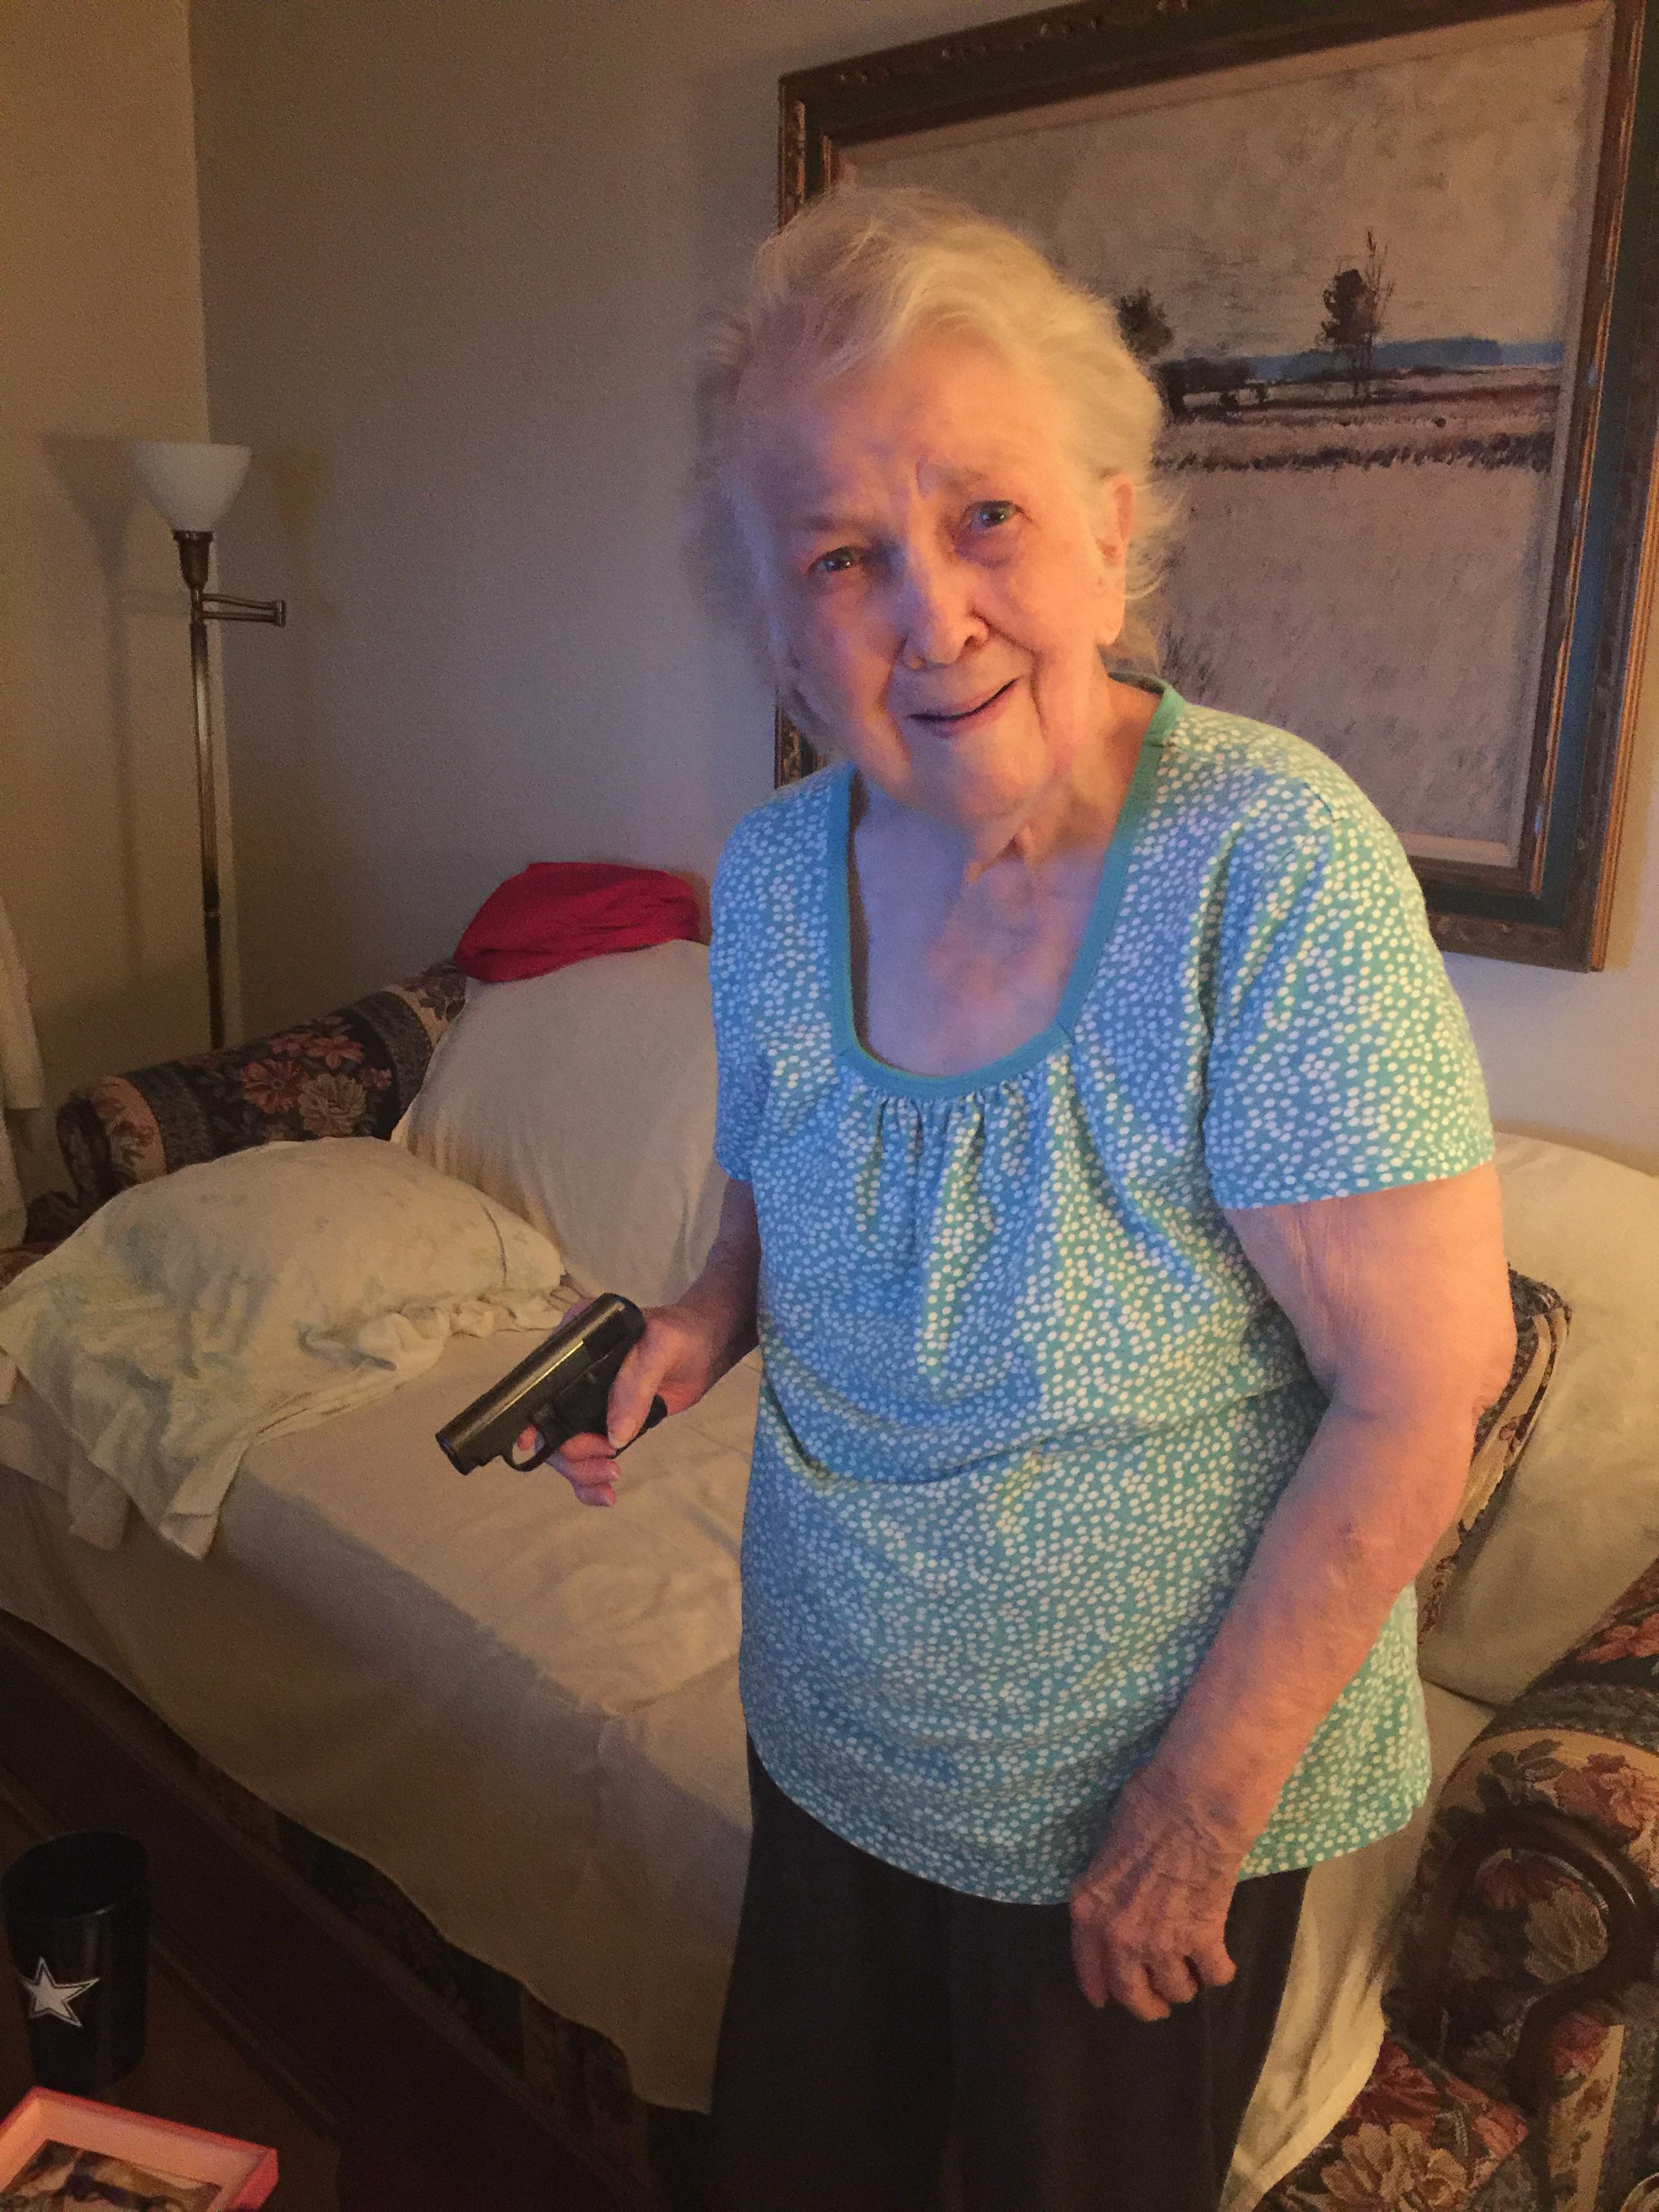 заняться старая поро бабушка вк жизнь, баланс